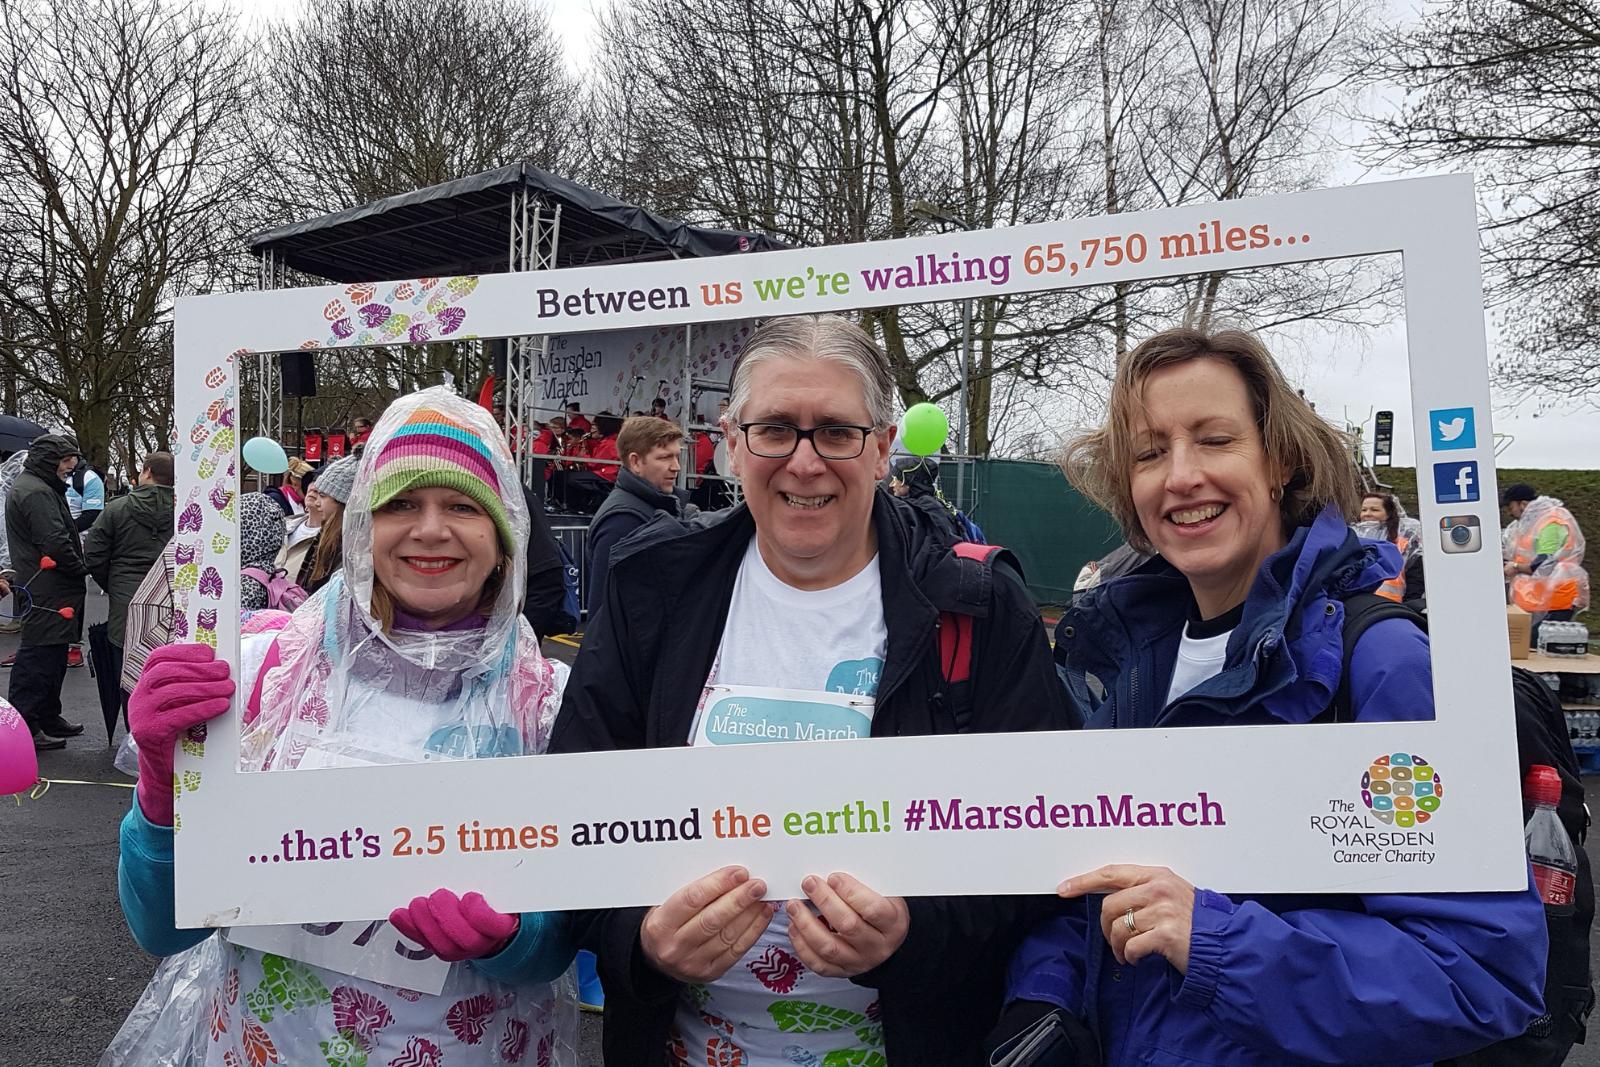 Marsden March 2019